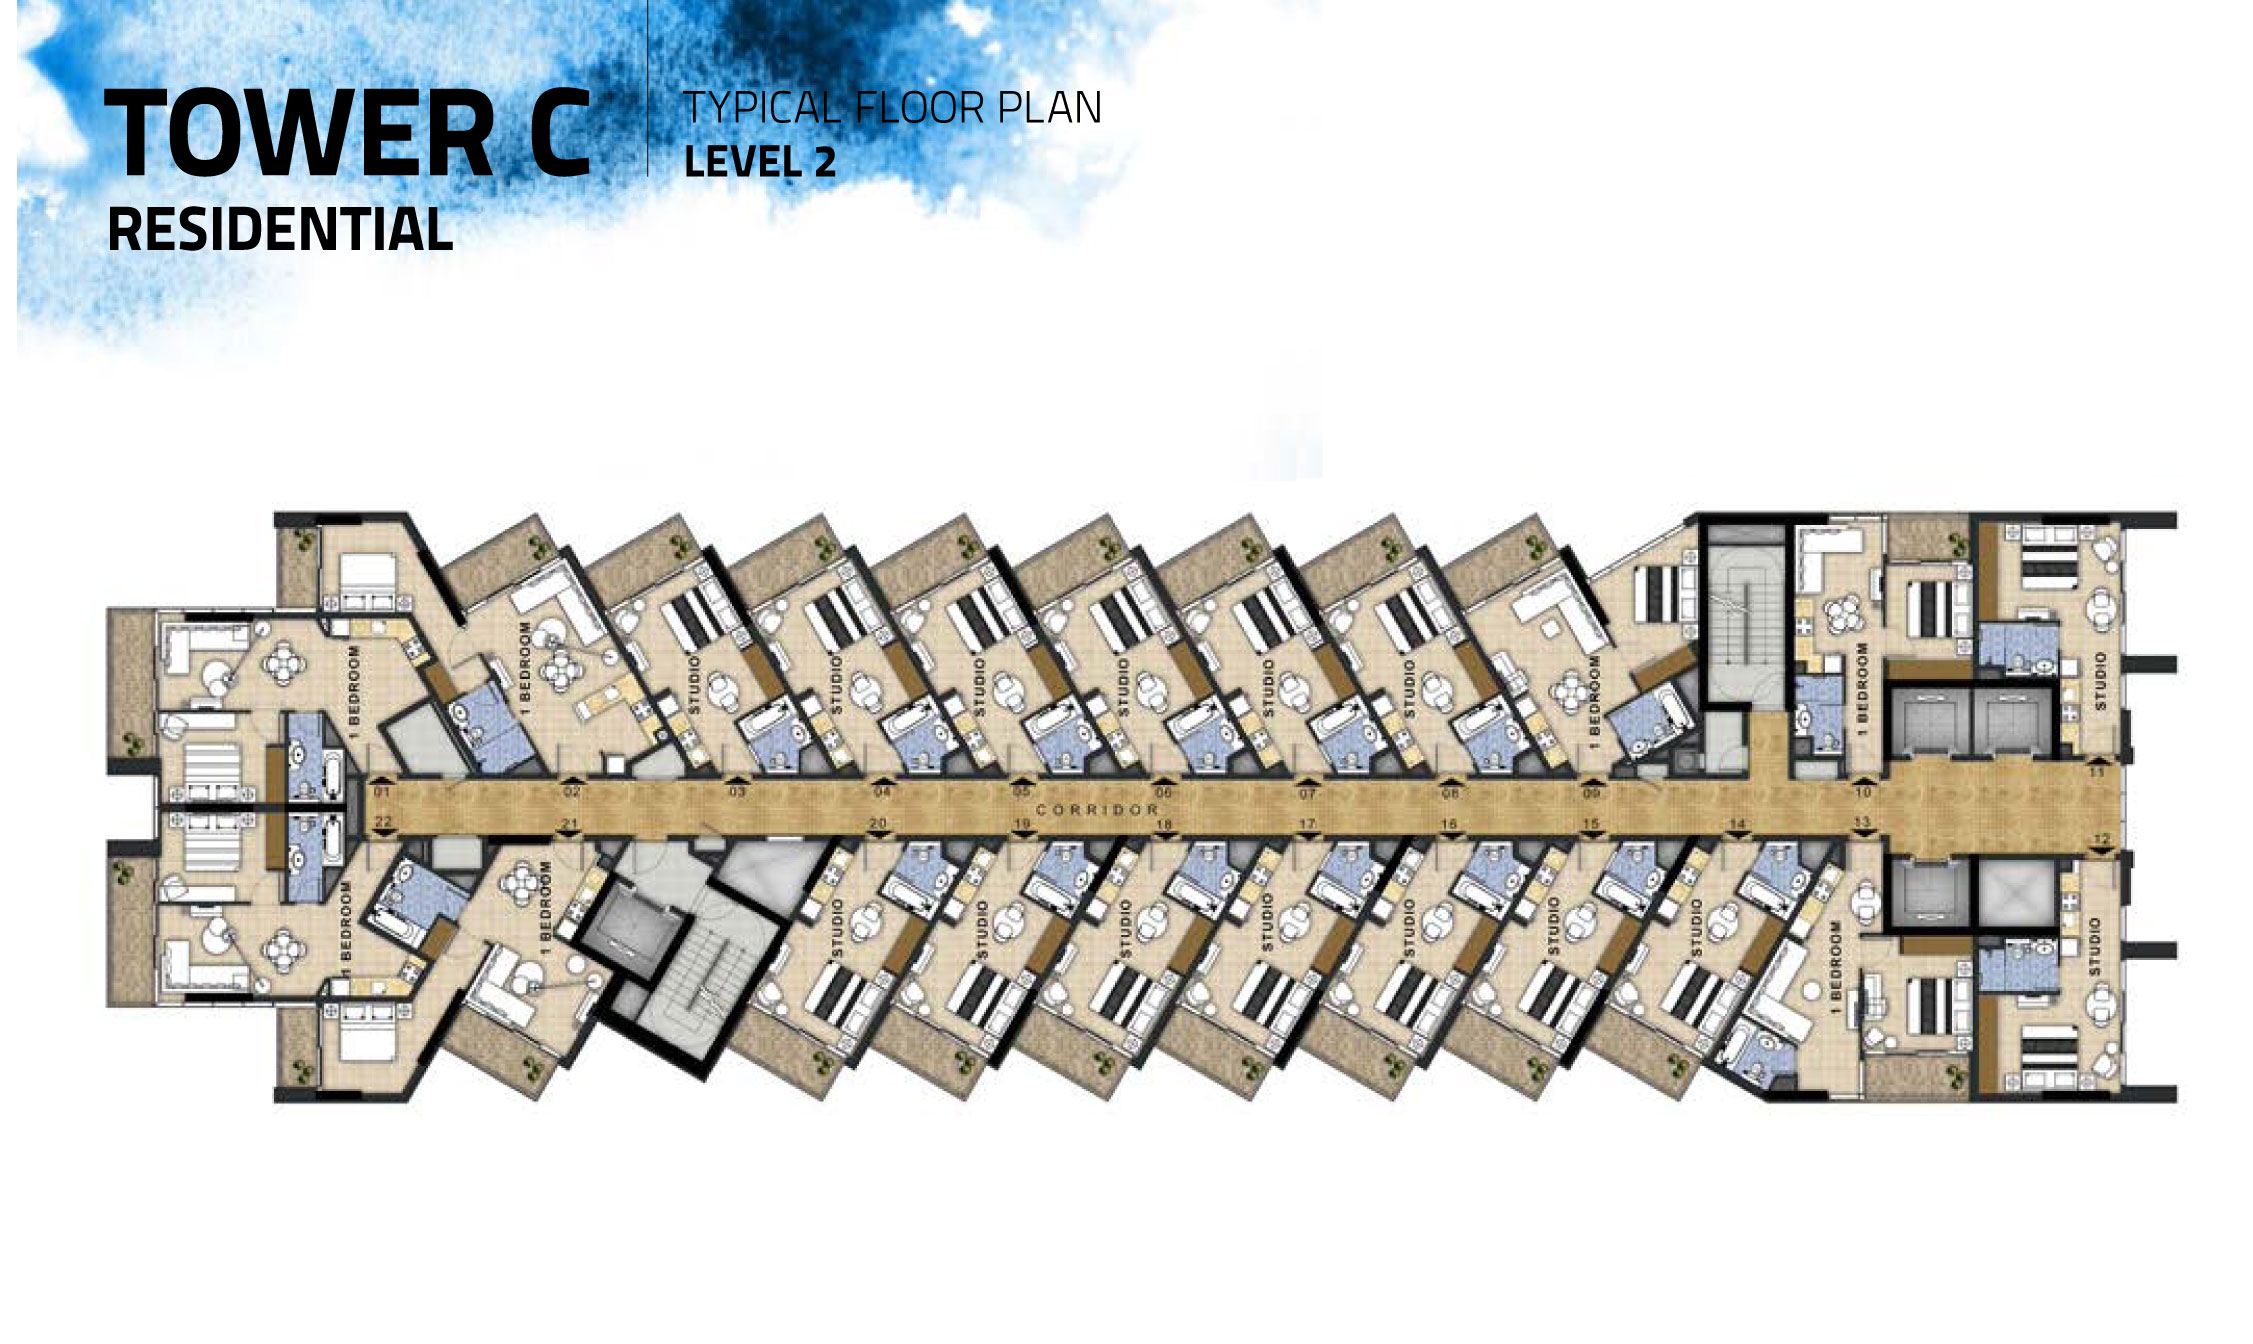 Tower-C-Level-2